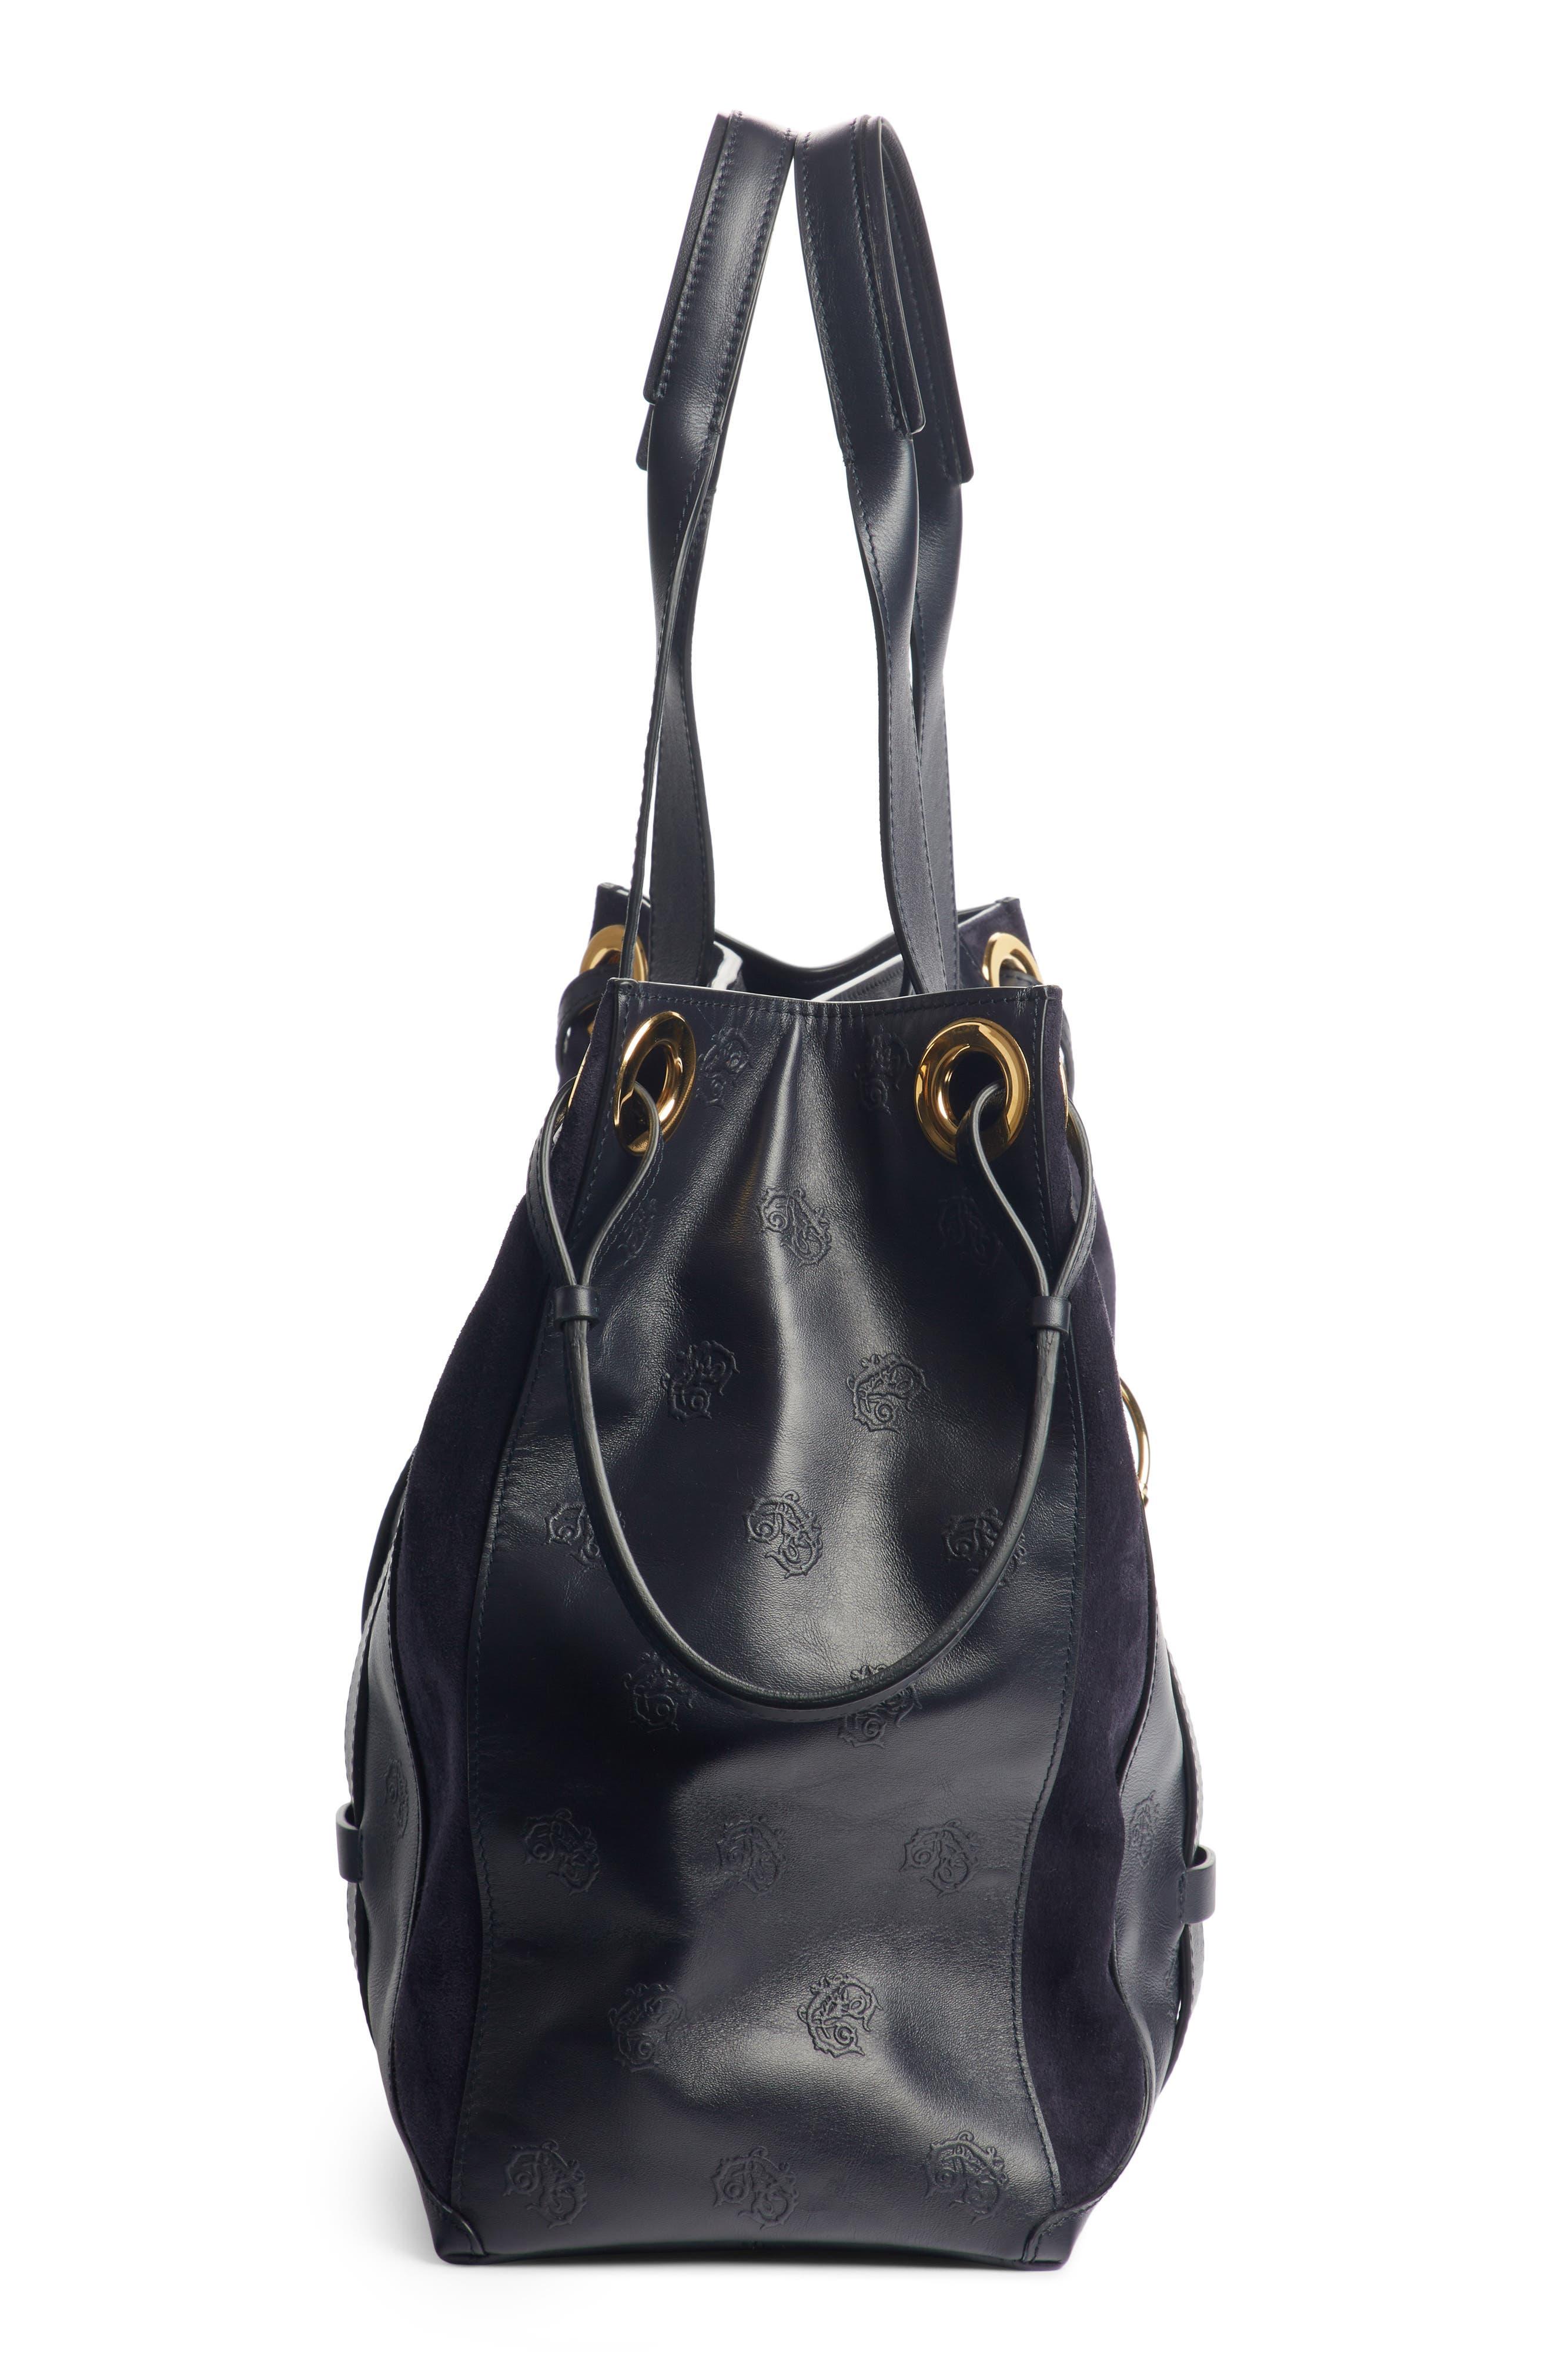 Medium Tao Embossed Leather Satchel,                             Alternate thumbnail 4, color,                             401